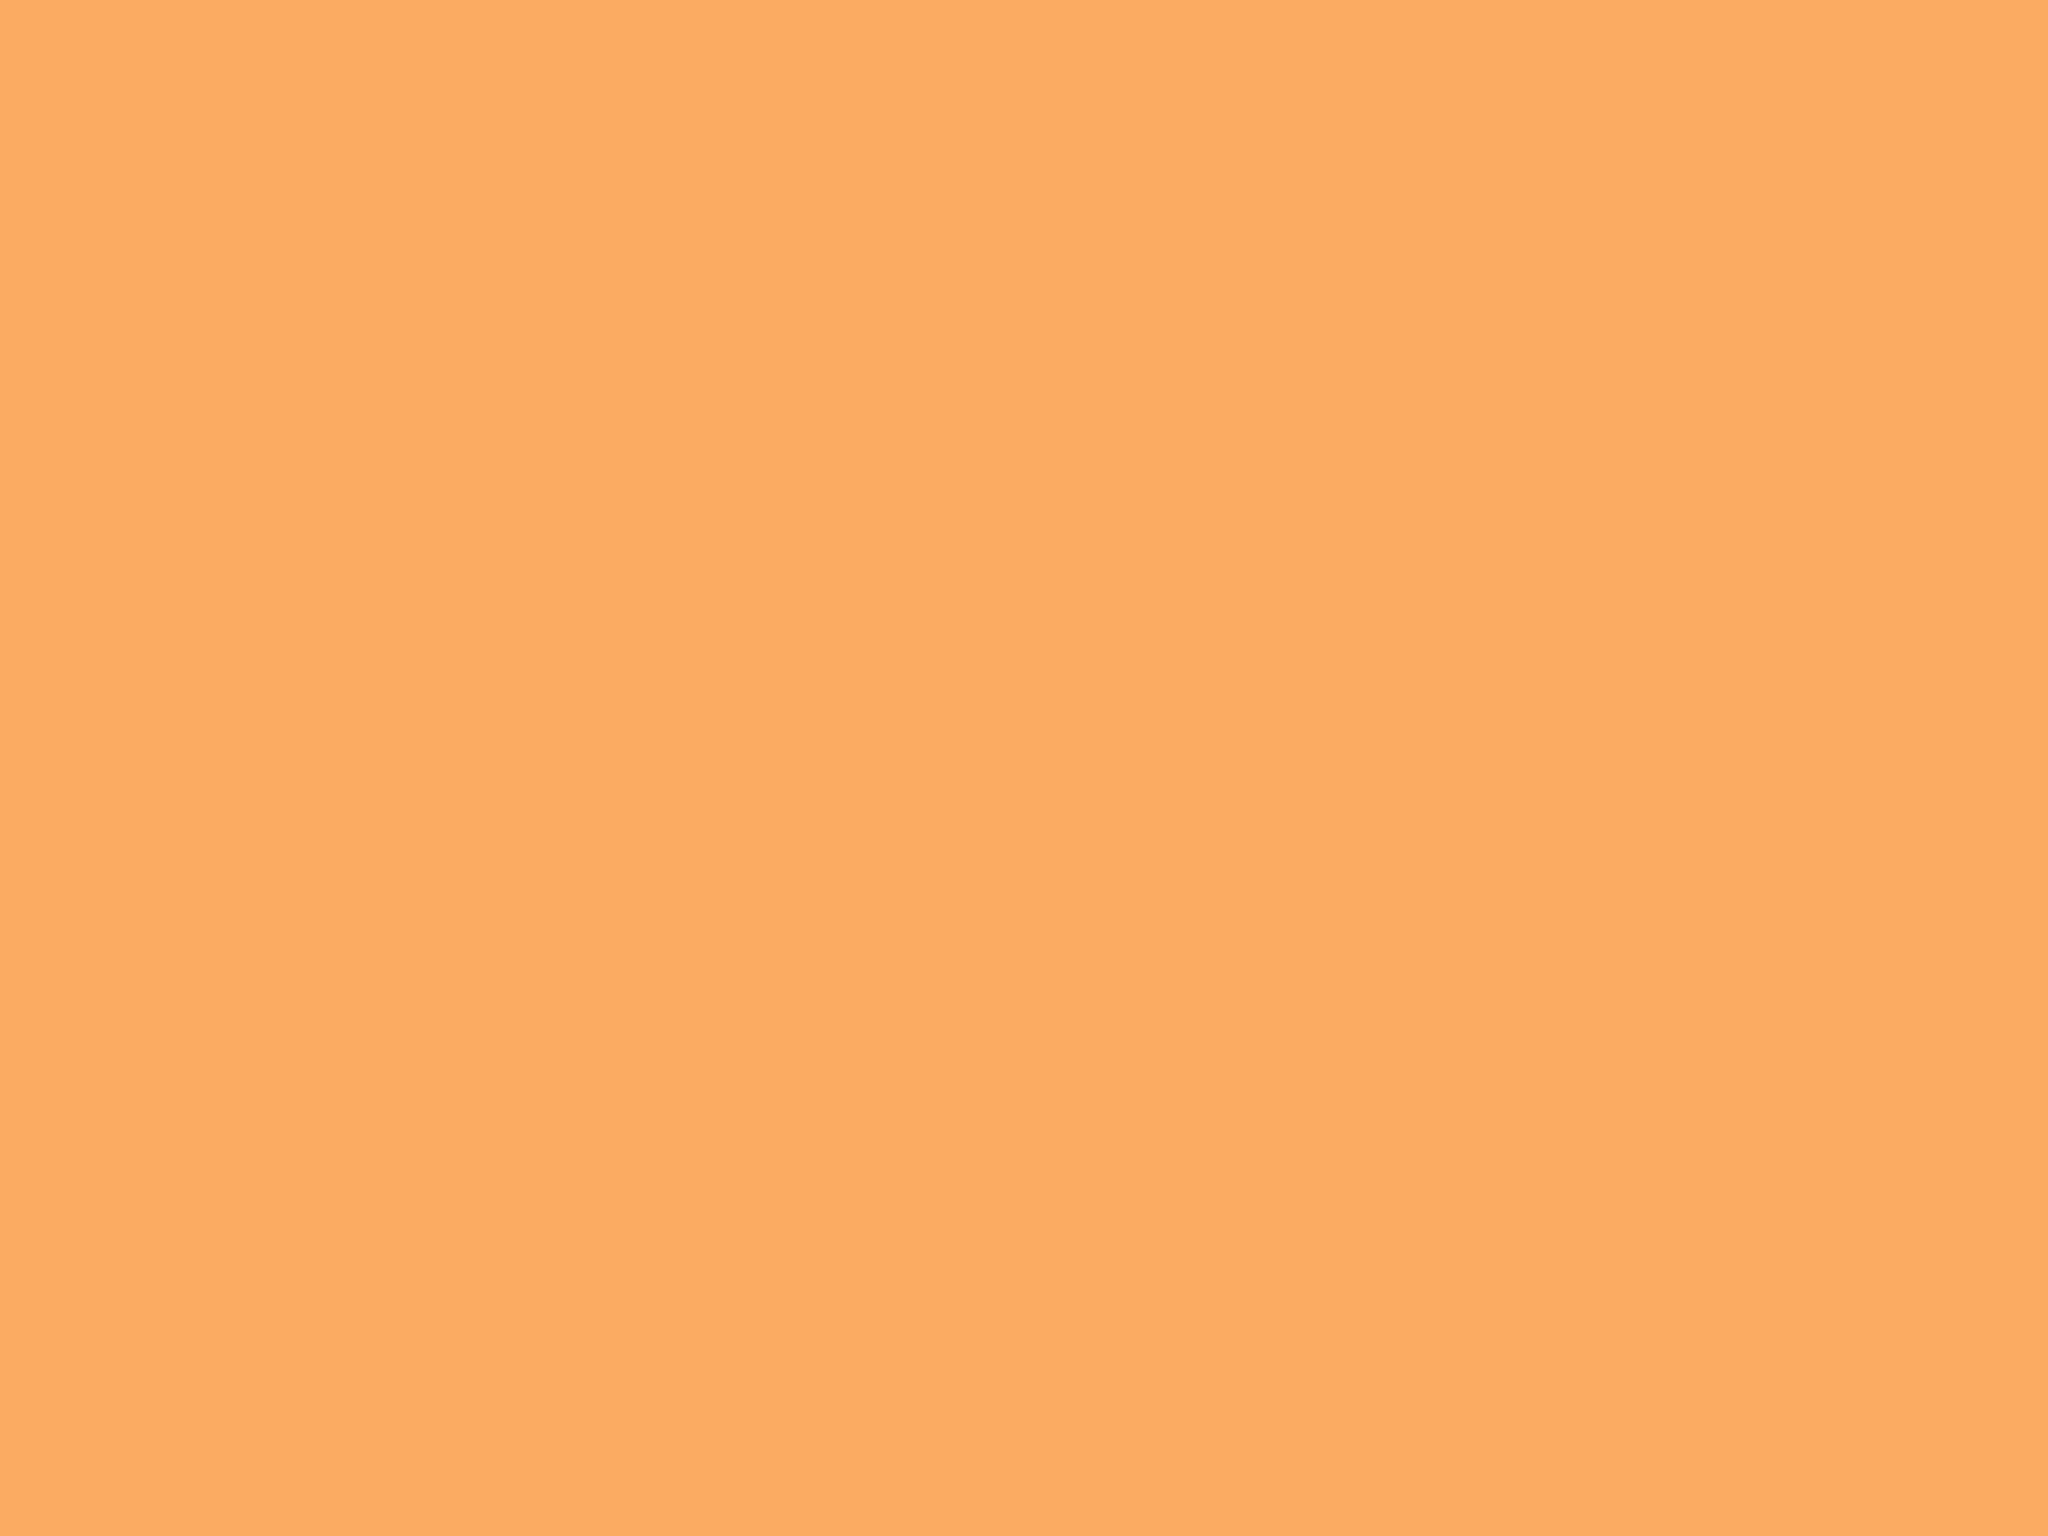 2048x1536 Rajah Solid Color Background